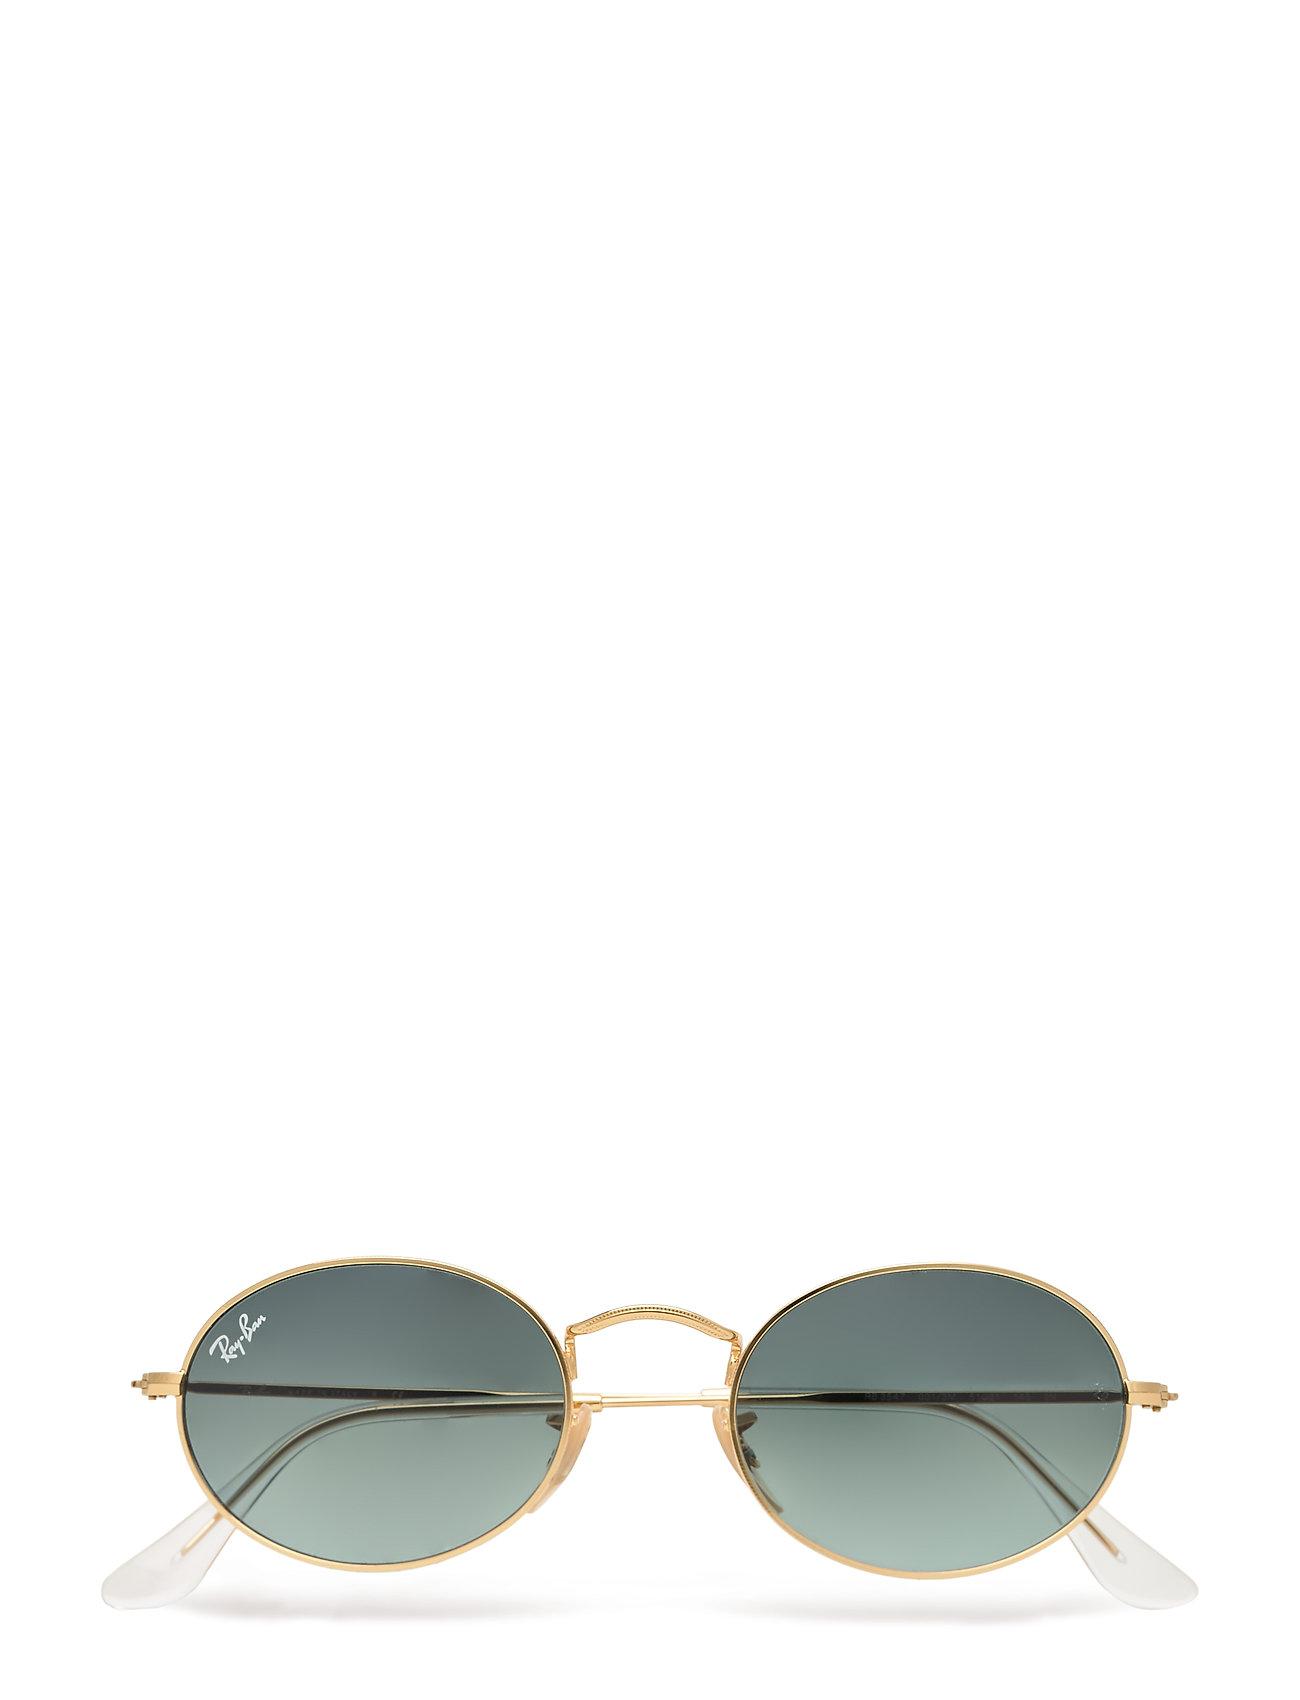 Image of Ray-Ban Sunglasses Solbriller Guld Ray-Ban (3292990407)